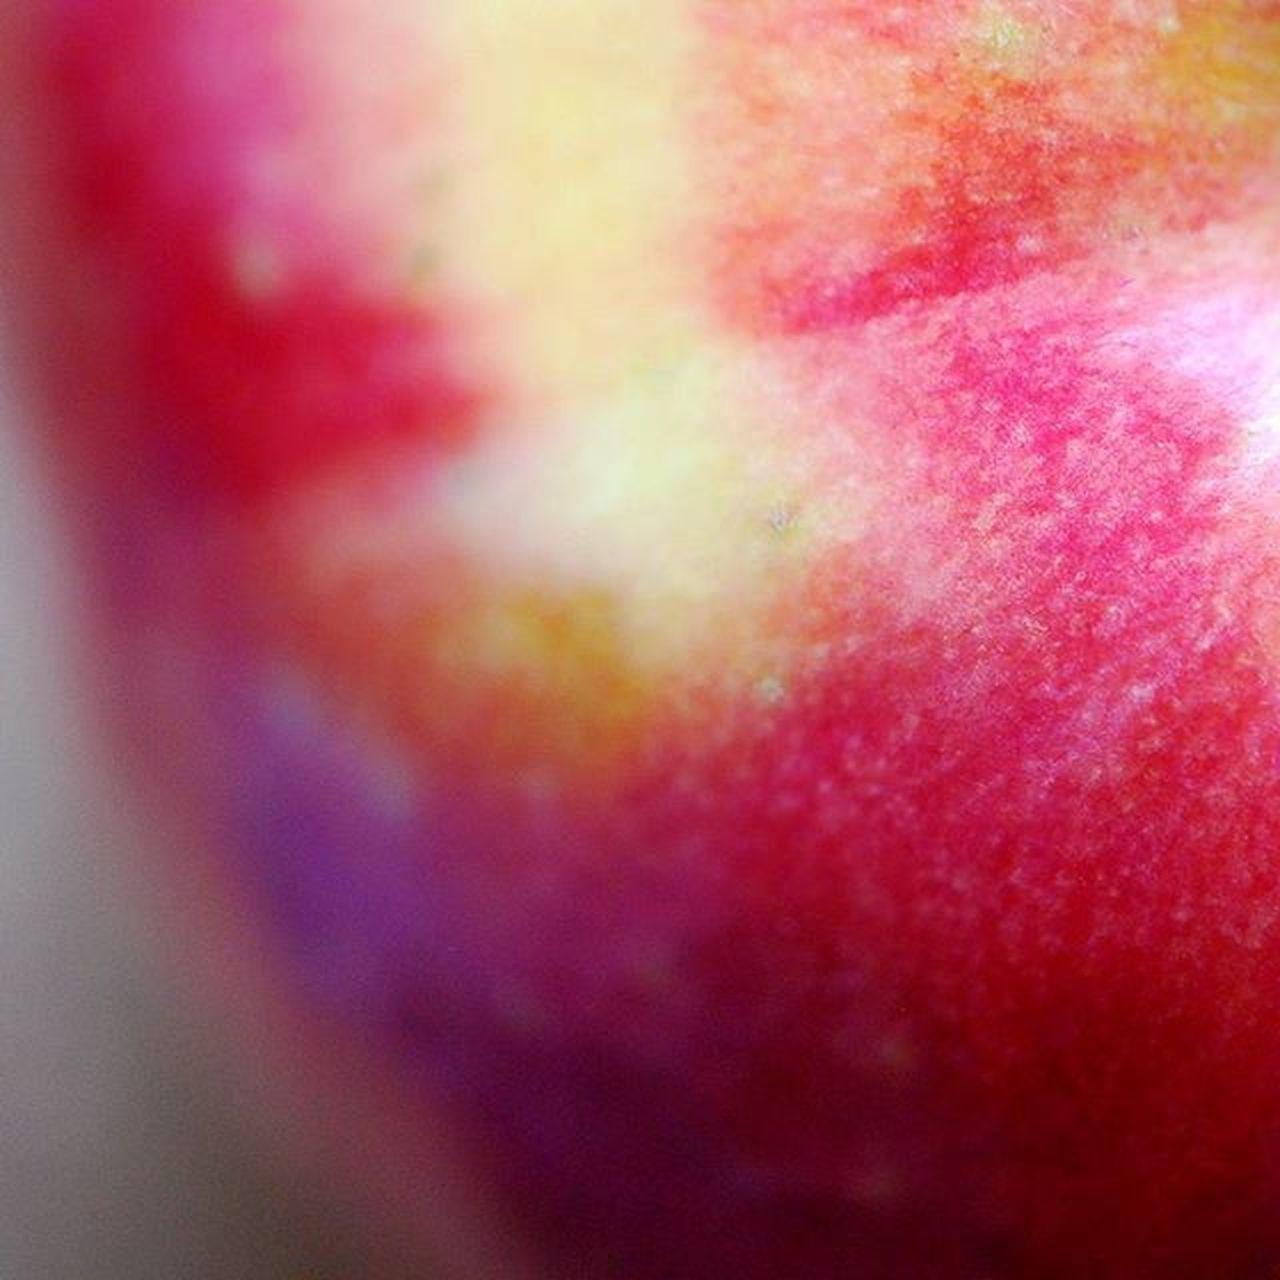 Lead_me_to_oblivion Macro Apple Closeup Nikon Photography Fruit